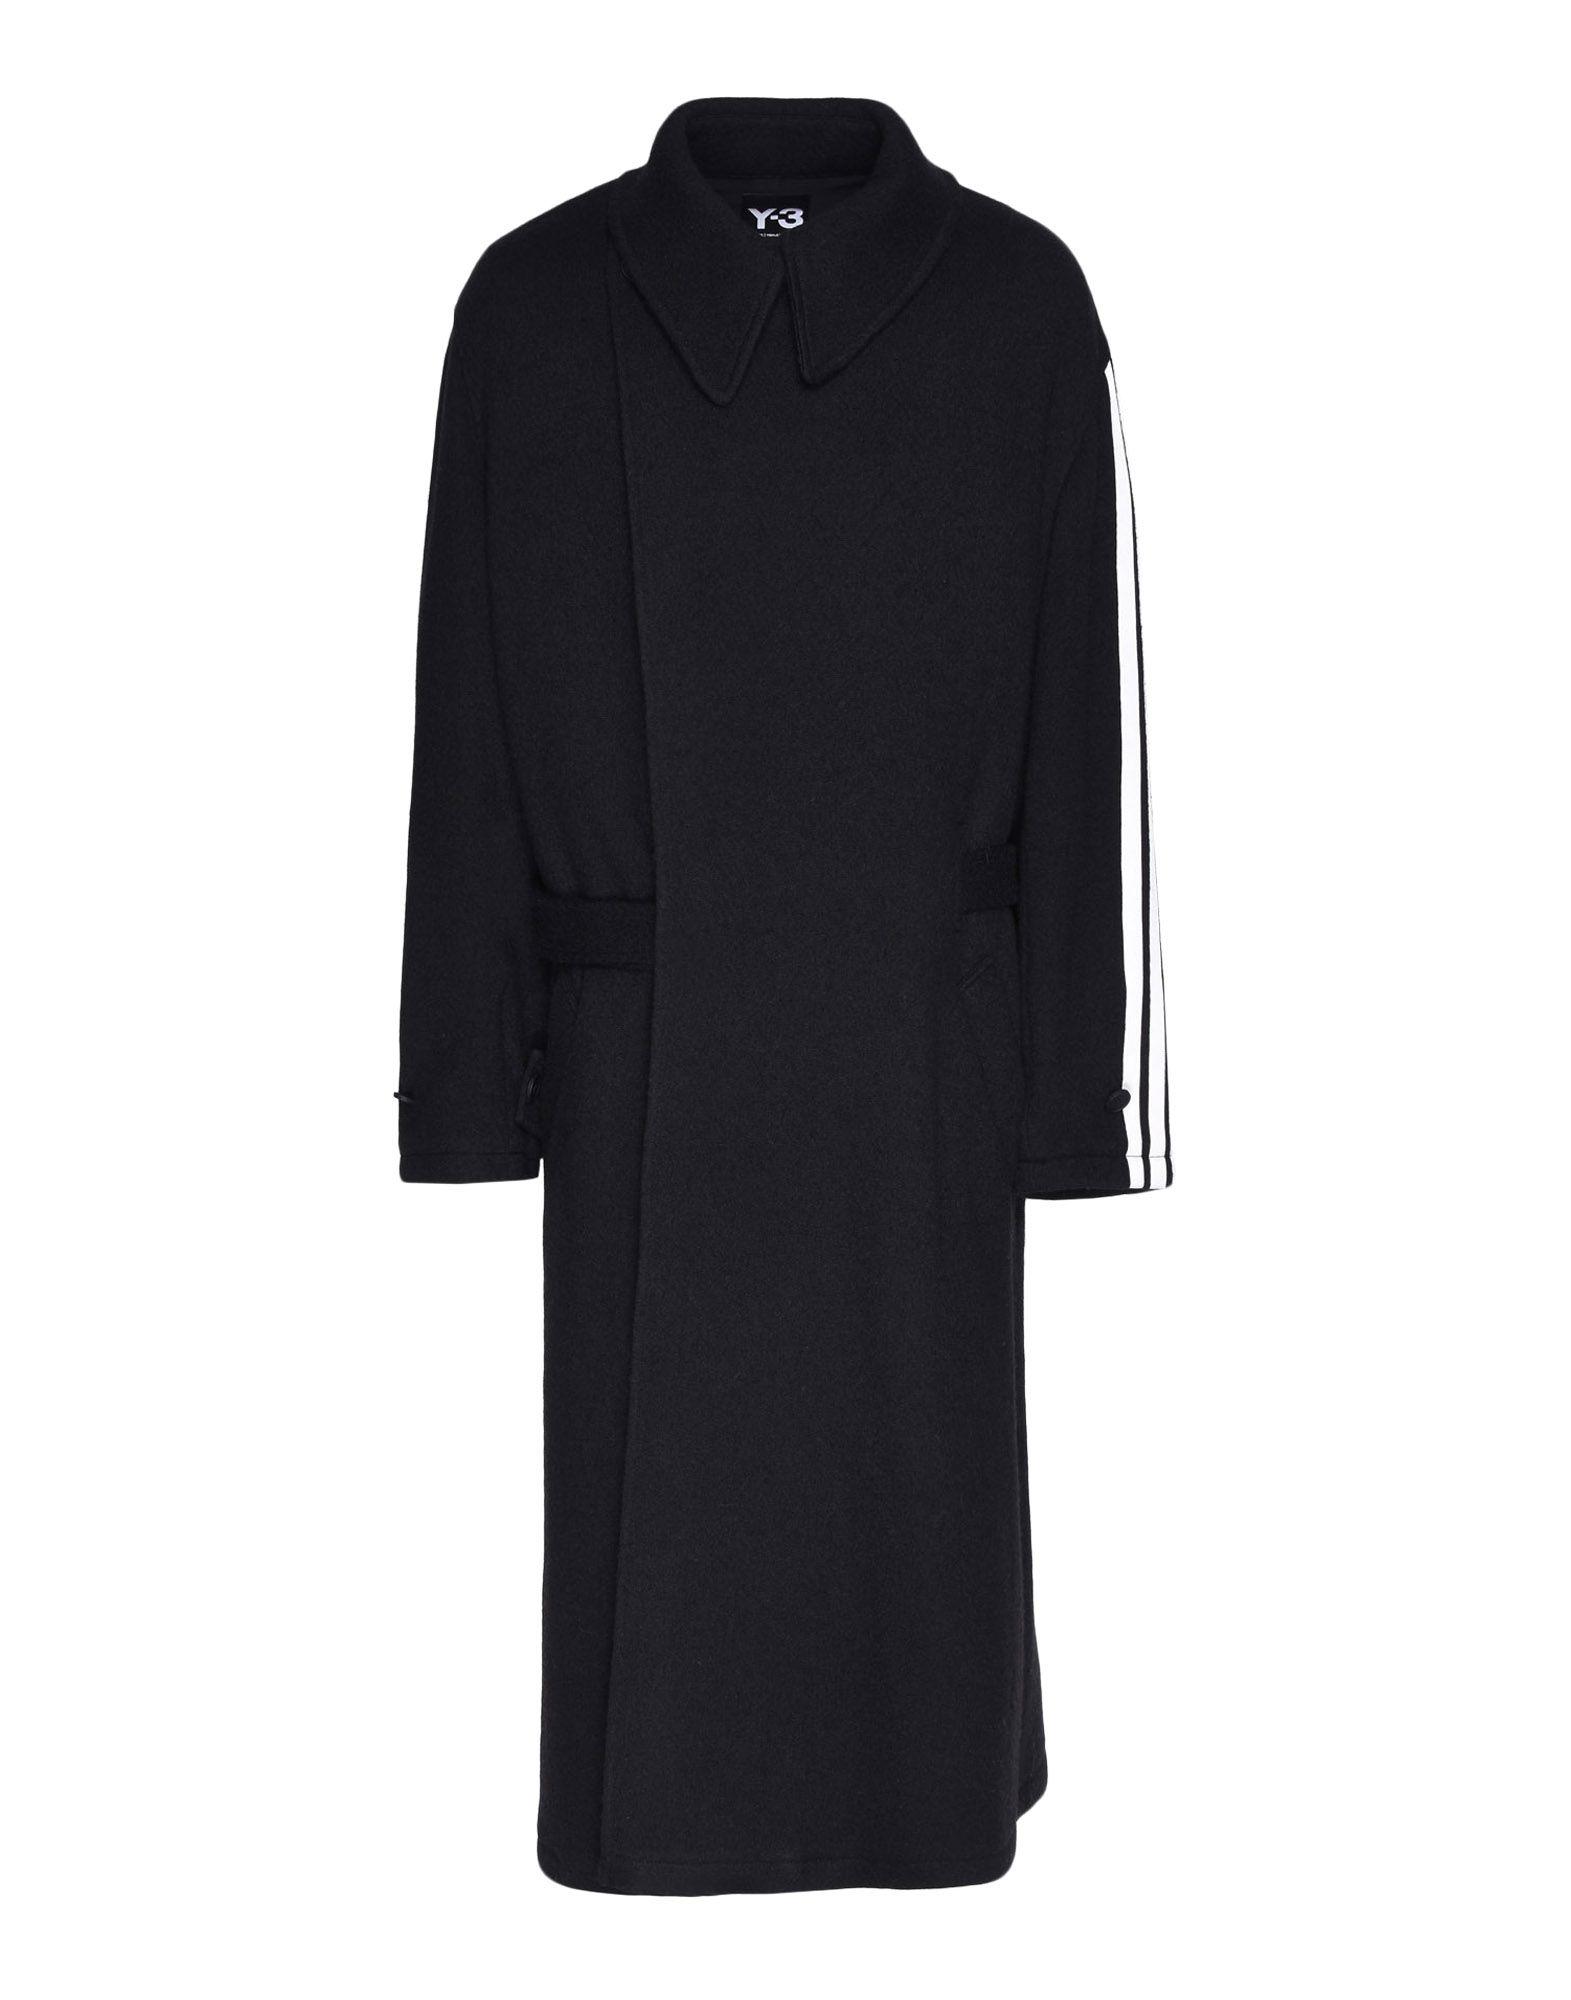 Y-3 Y-3 Tailored Wool Coat Coat Man f